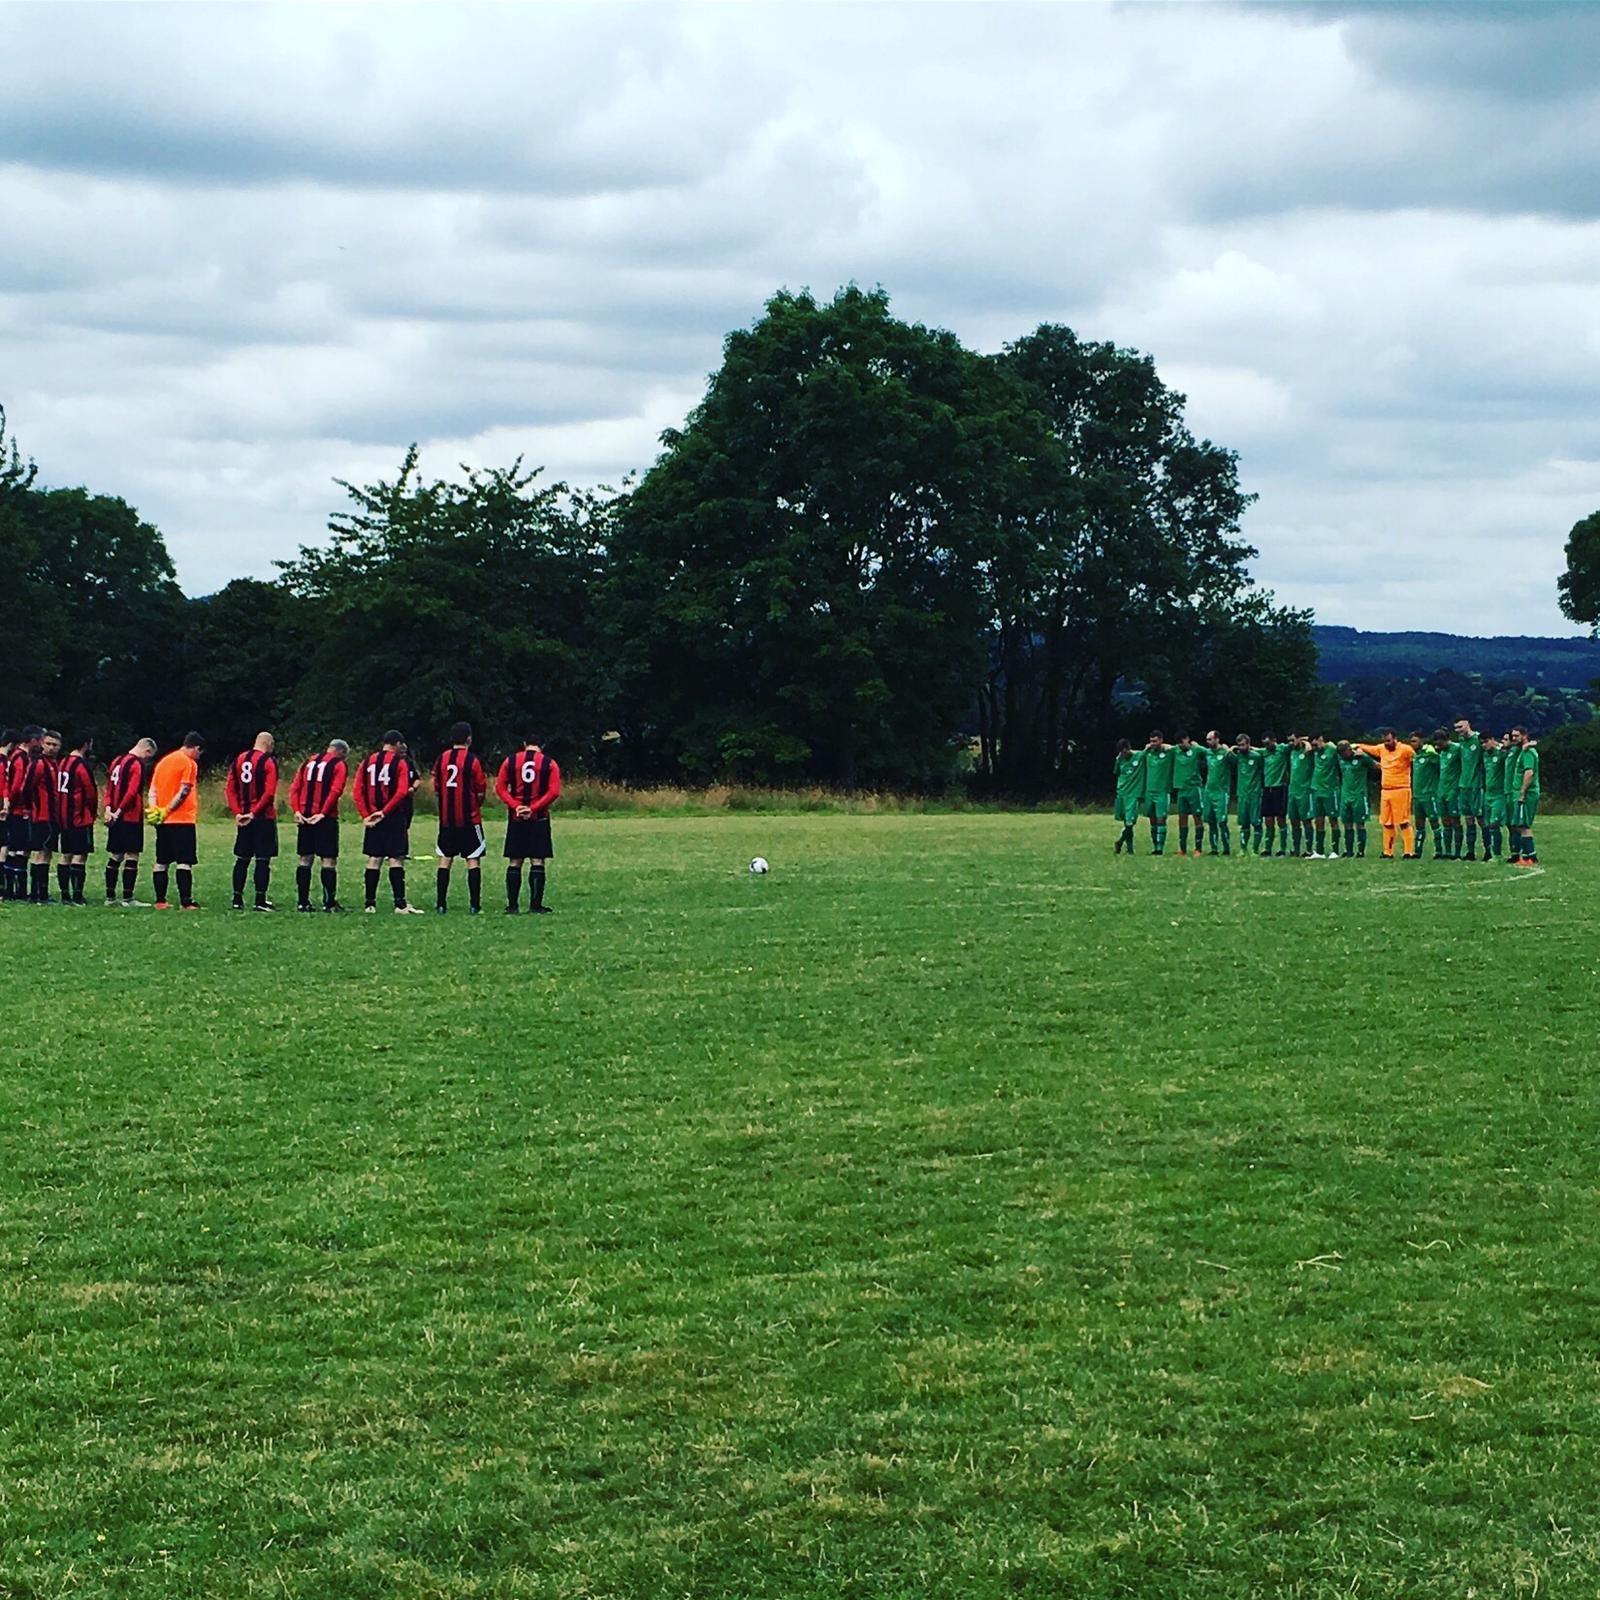 Otterton_football_club_memorial_match_july19.jpg